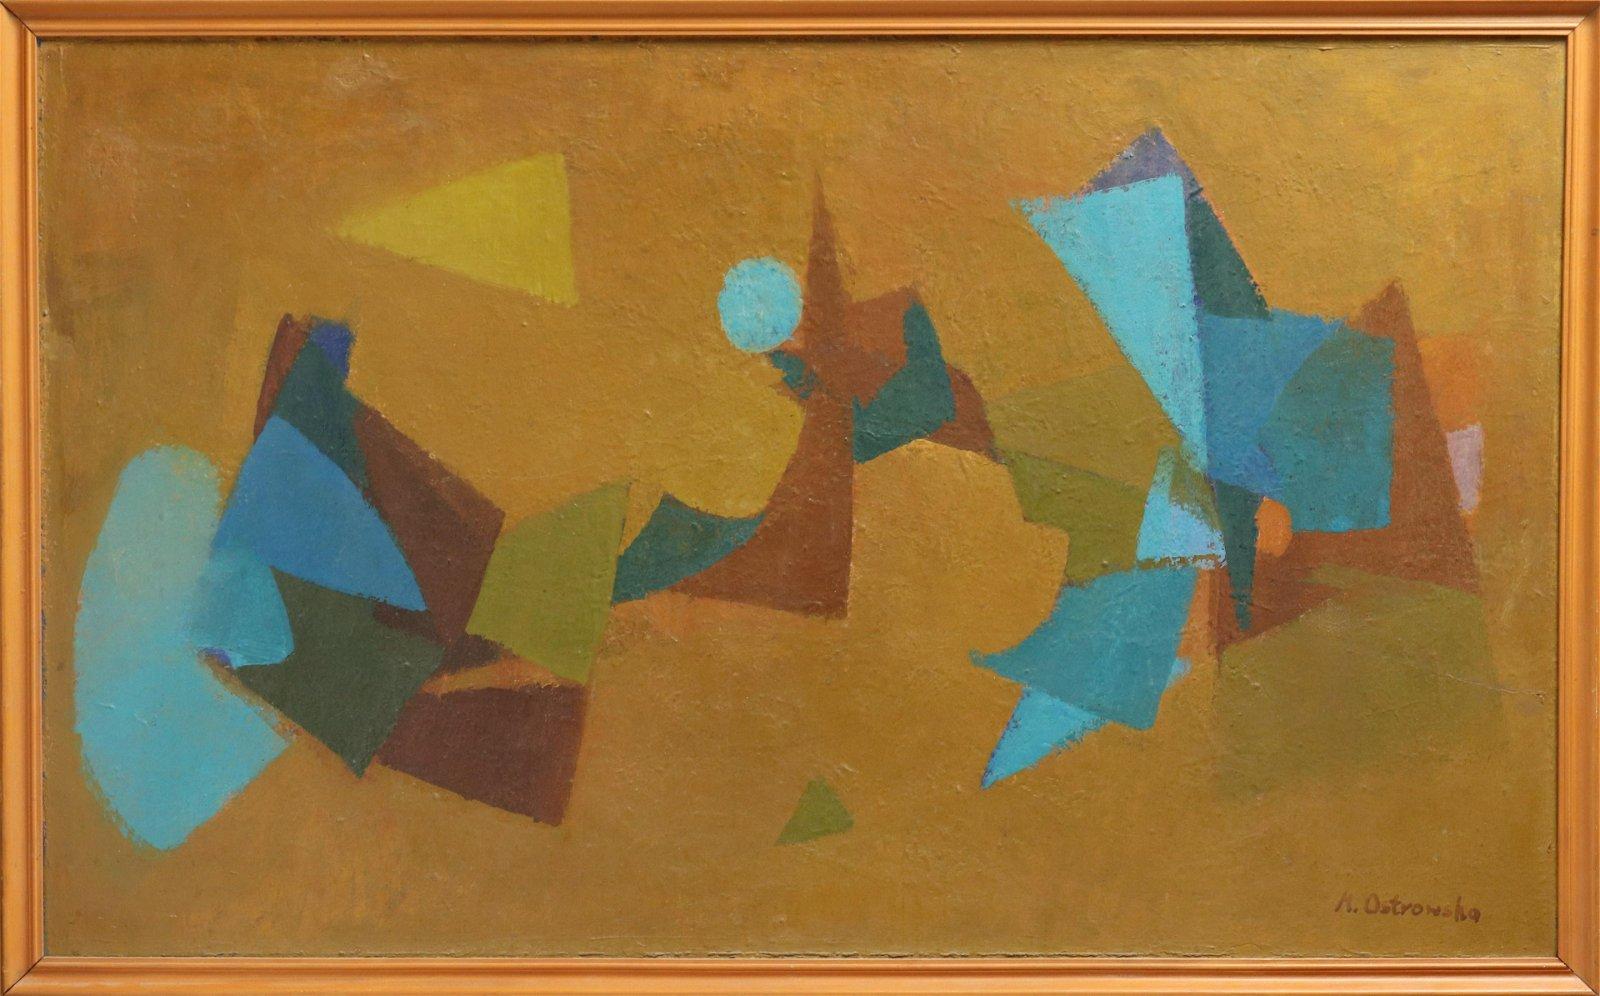 M. Ostrowska Abstract Geometric Tempera on Board